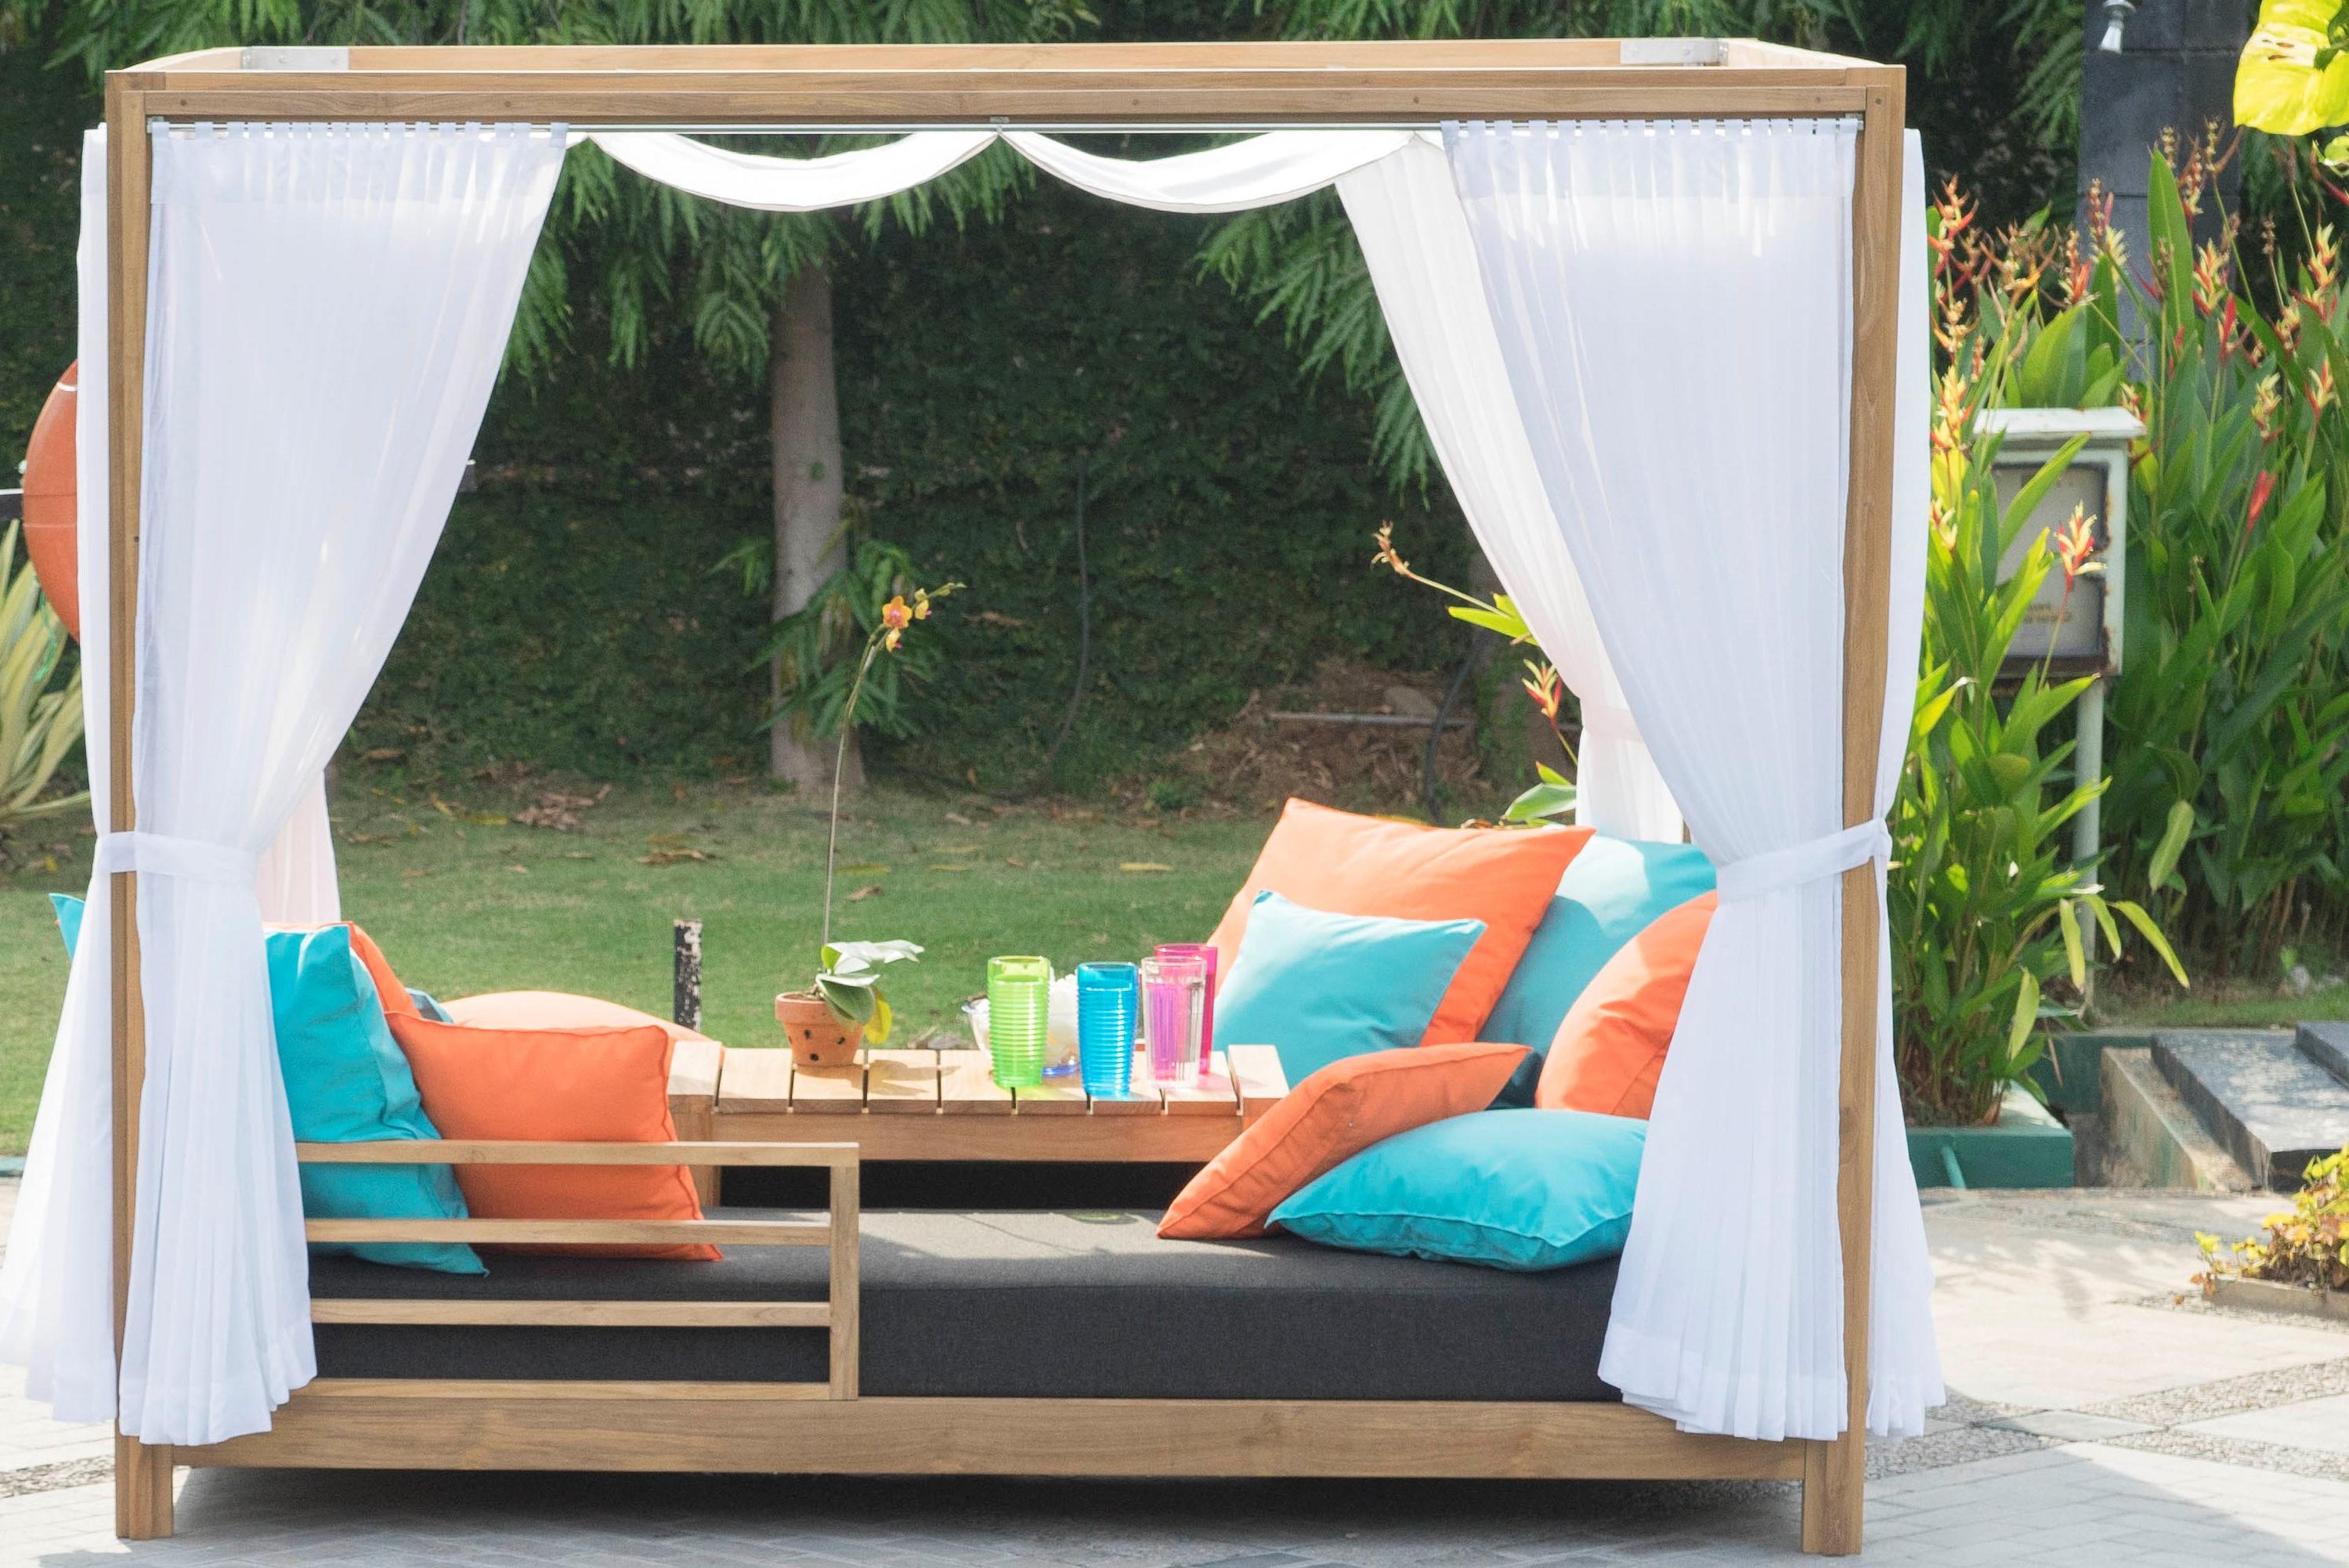 Favorite Resort Patio Daybeds Inside 39 Resort Pool Furniture, Grand Resort Patio Furniture (View 4 of 20)